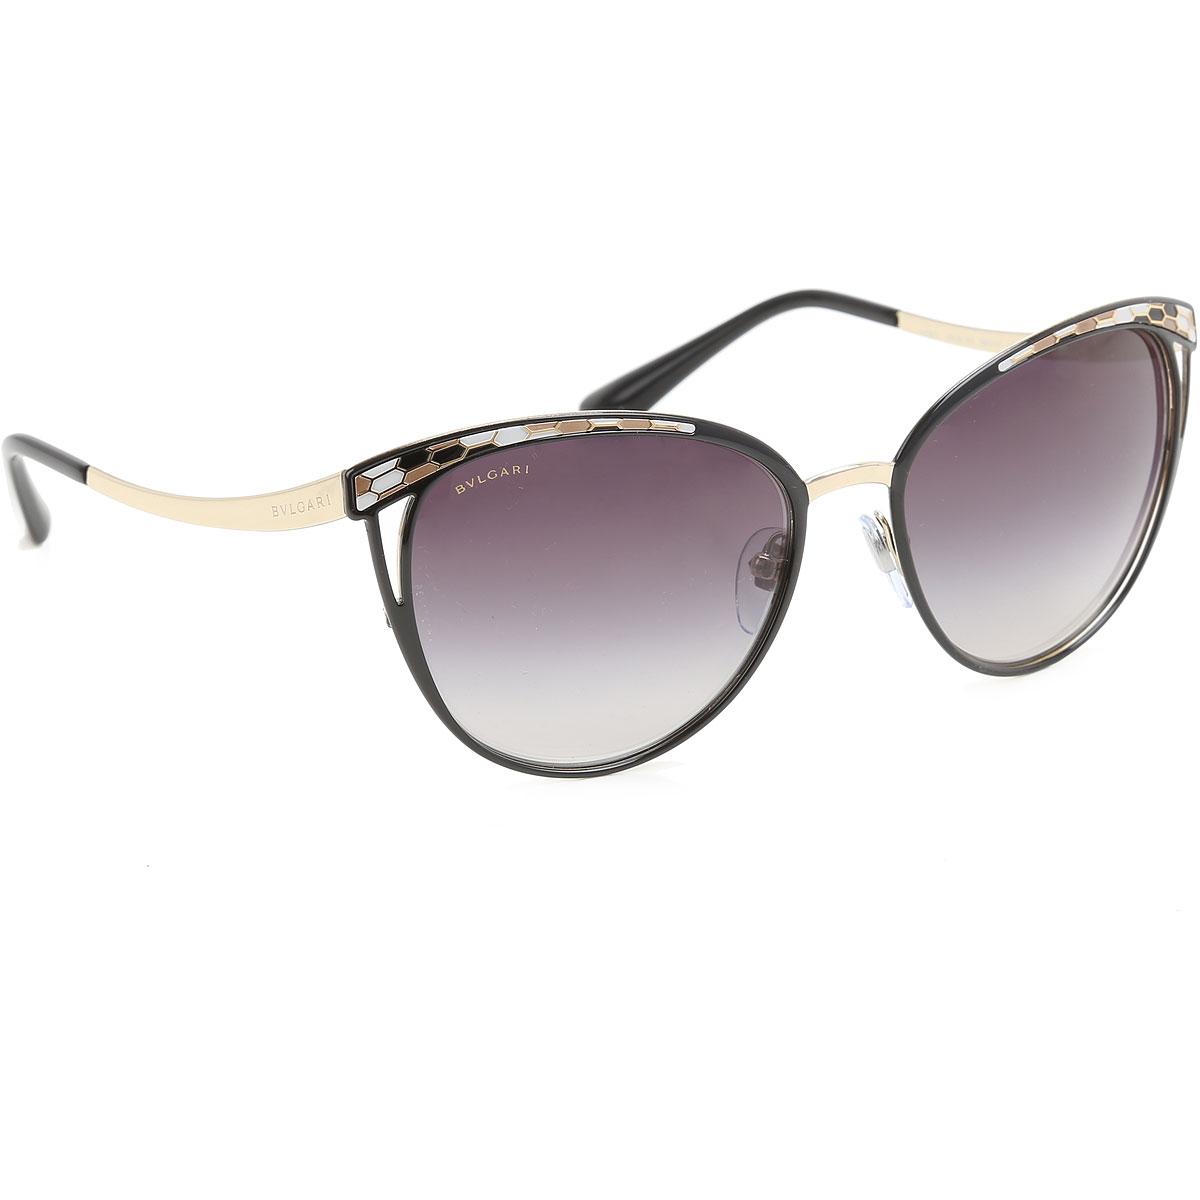 Bvl Sunglasses  sunglasses bvlgari style code bv6083 2018 8g